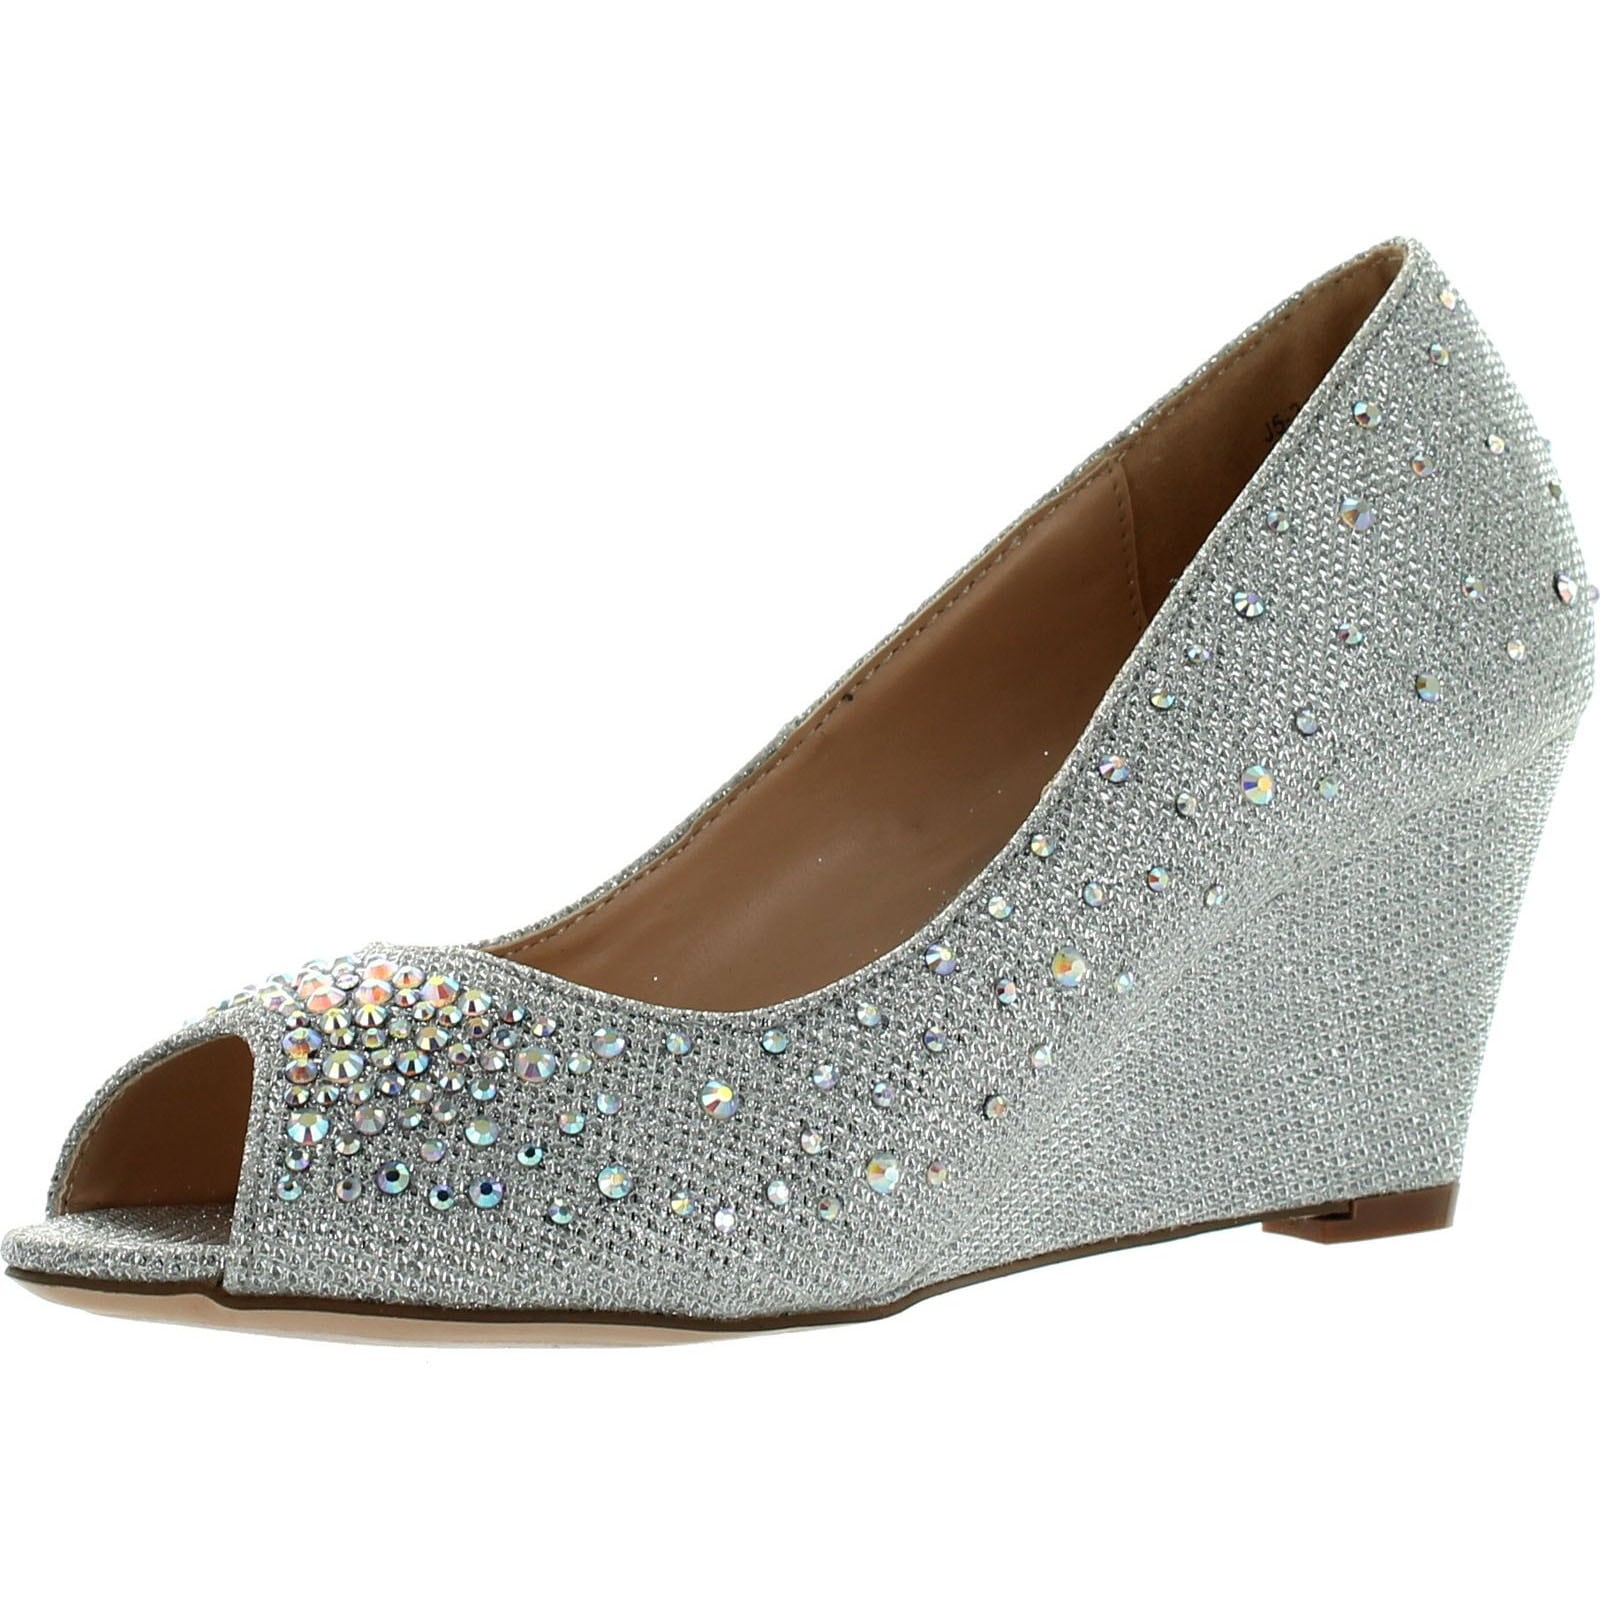 9c17415b4a335 Blossom Womens Half-3 Dressy Wedge Shoes